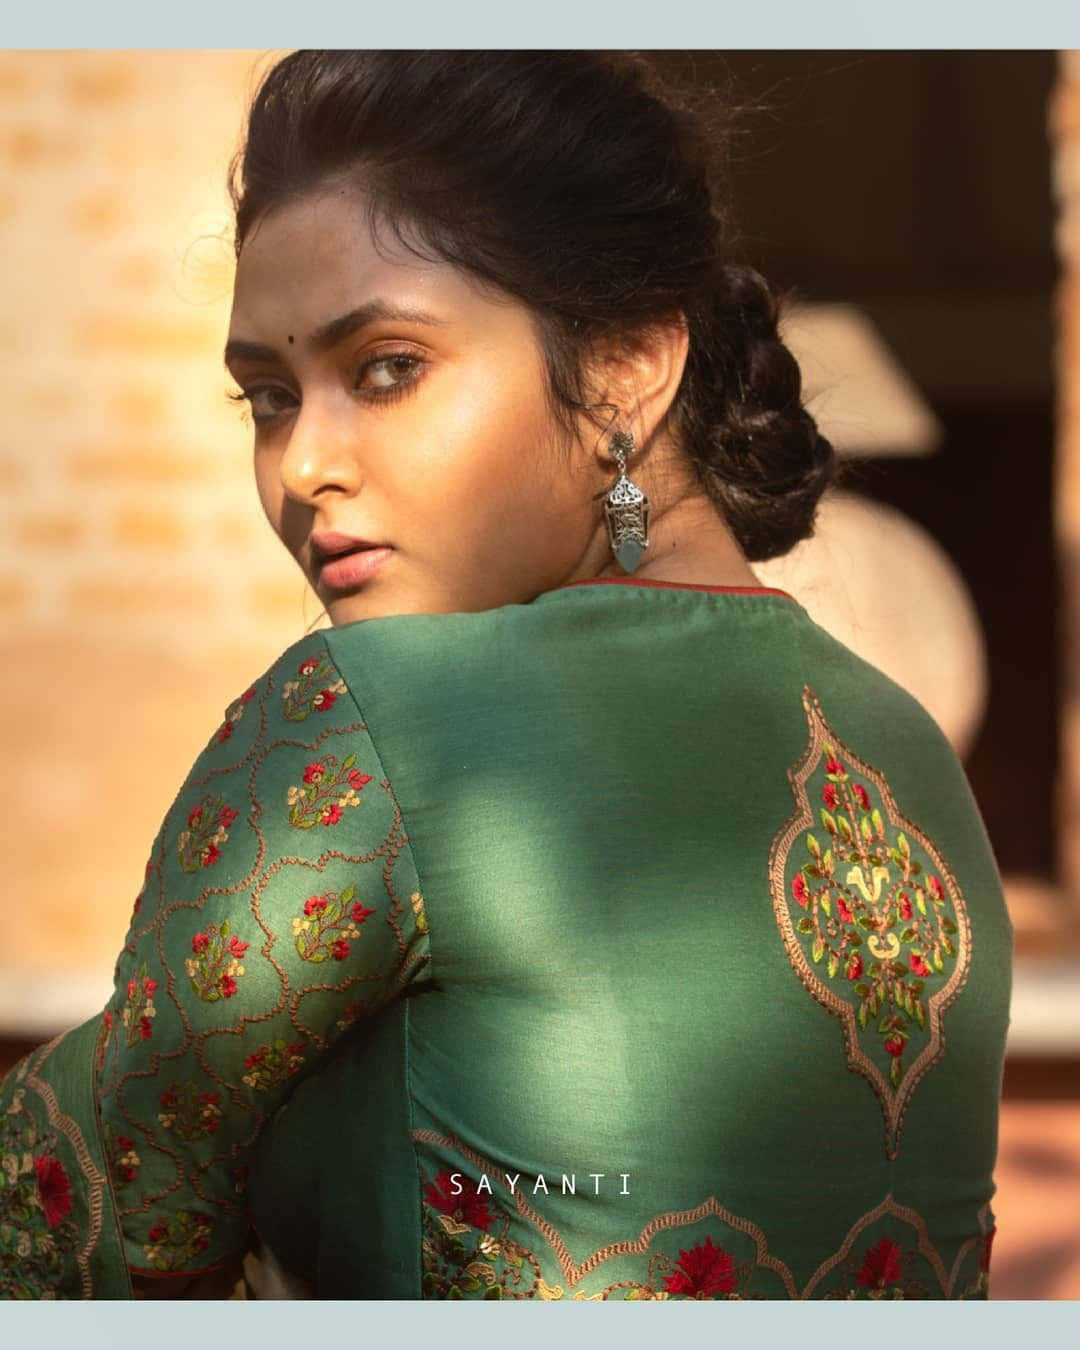 Persian architecture embroidery blouse-Sayanti ghosh-1